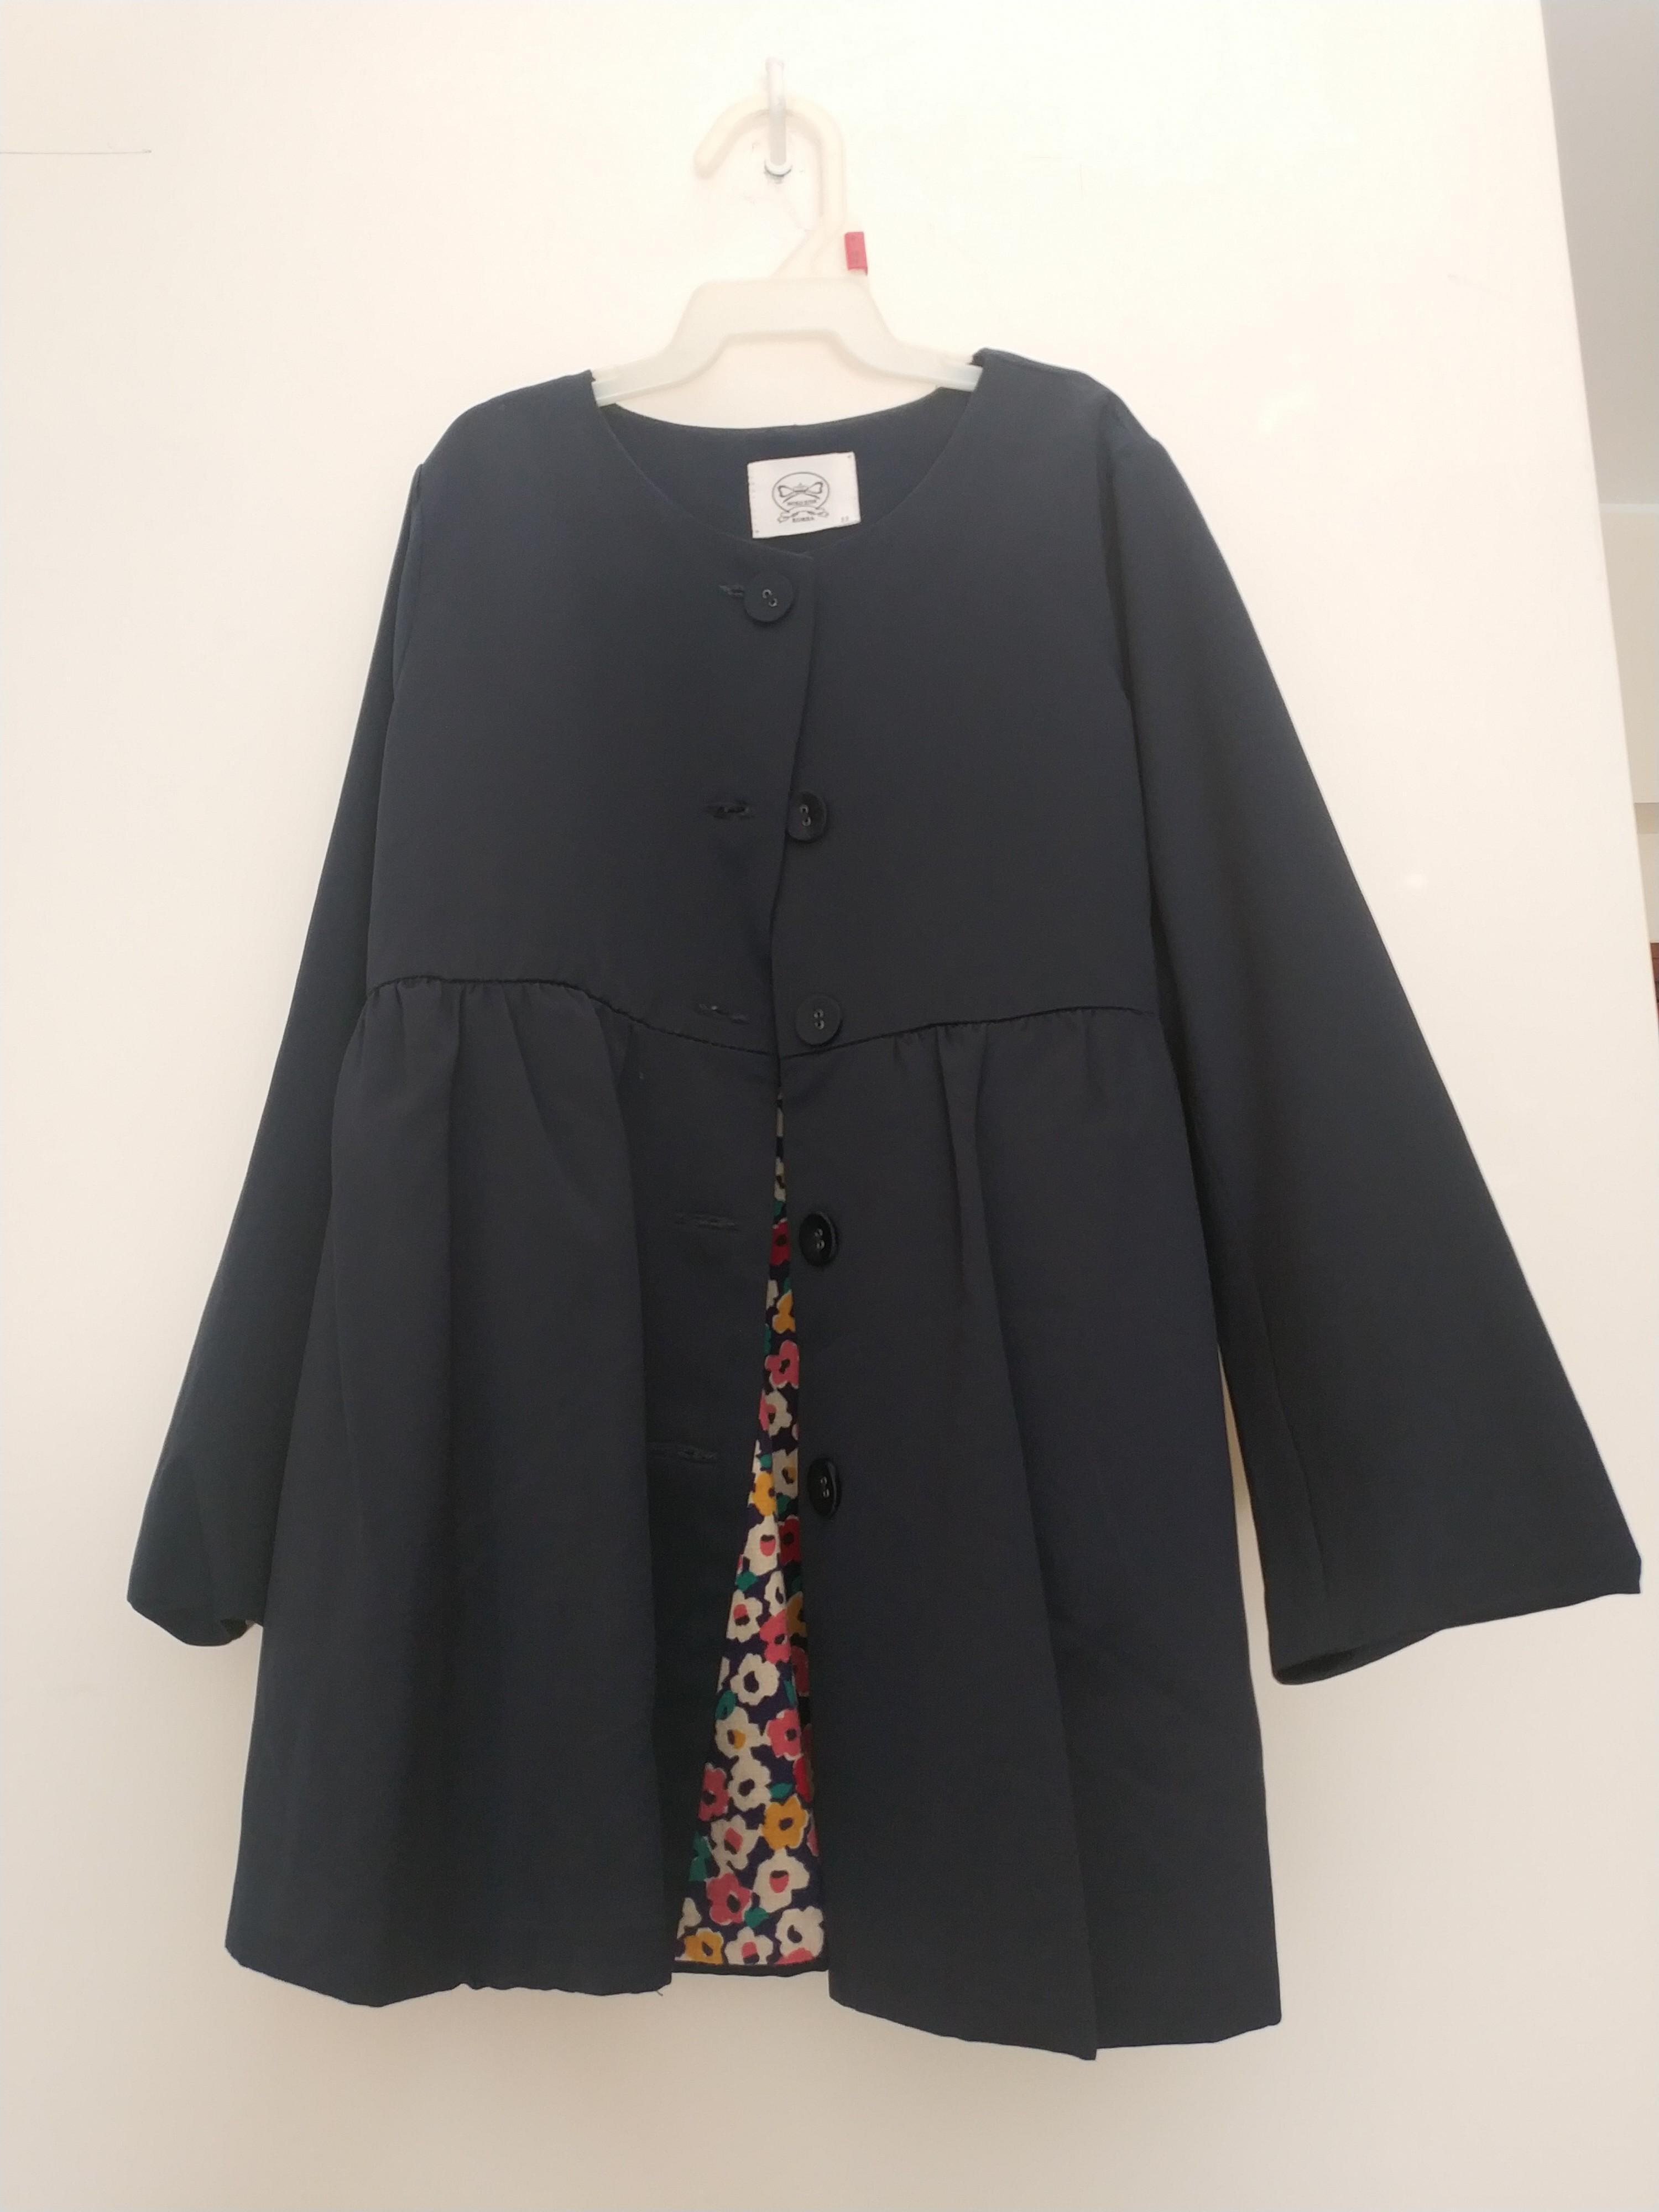 Korean jacket 斯文面試簿褸